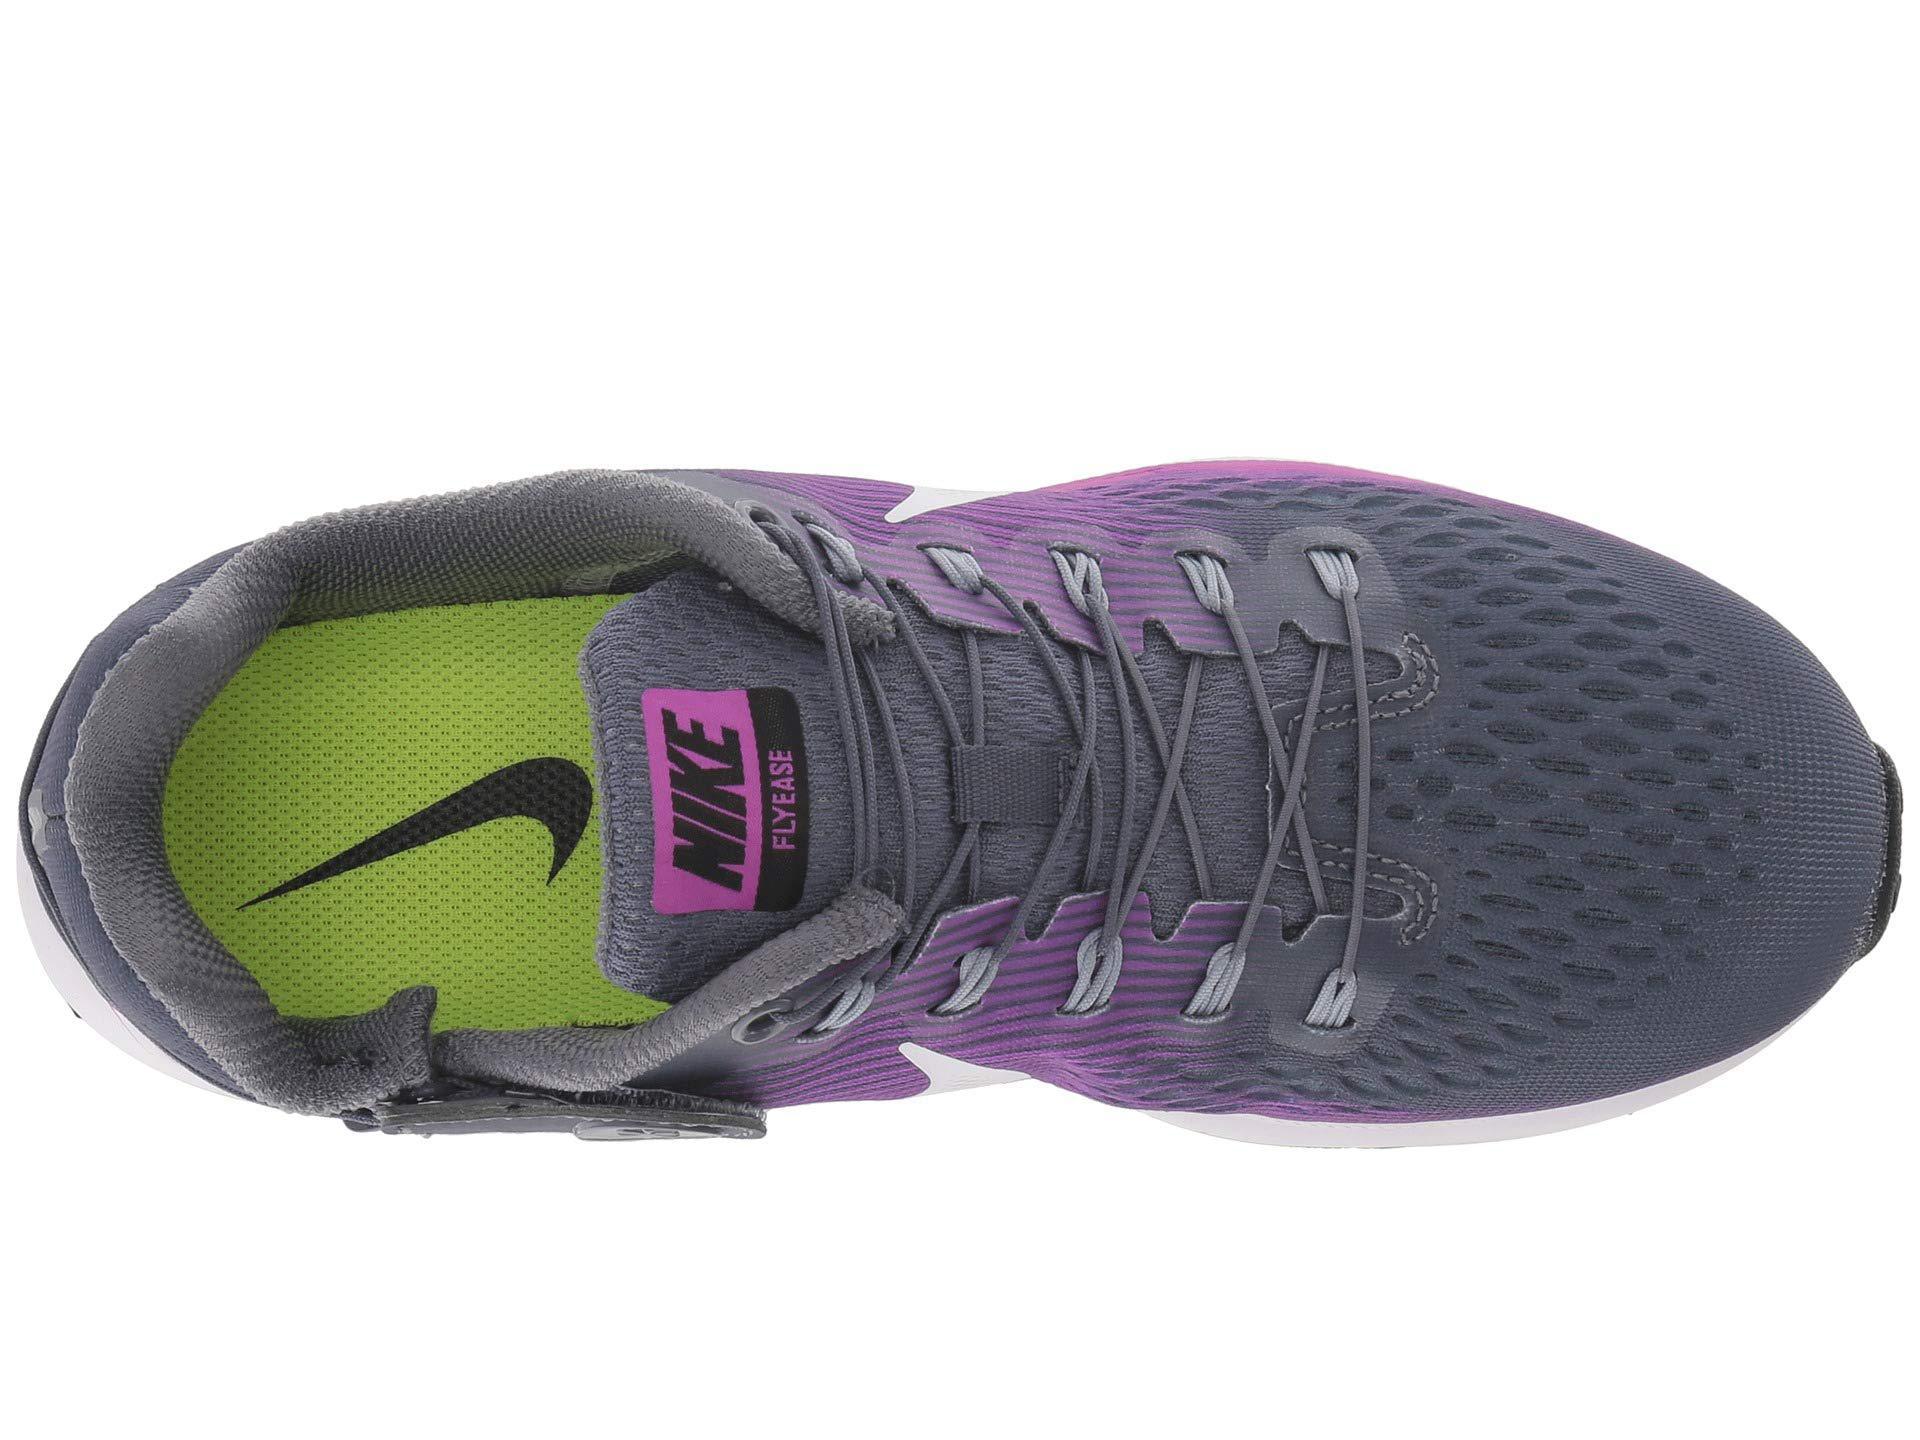 8f6a916a0 Nike - Purple Air Zoom Pegasus 34 Flyease - Lyst. View fullscreen